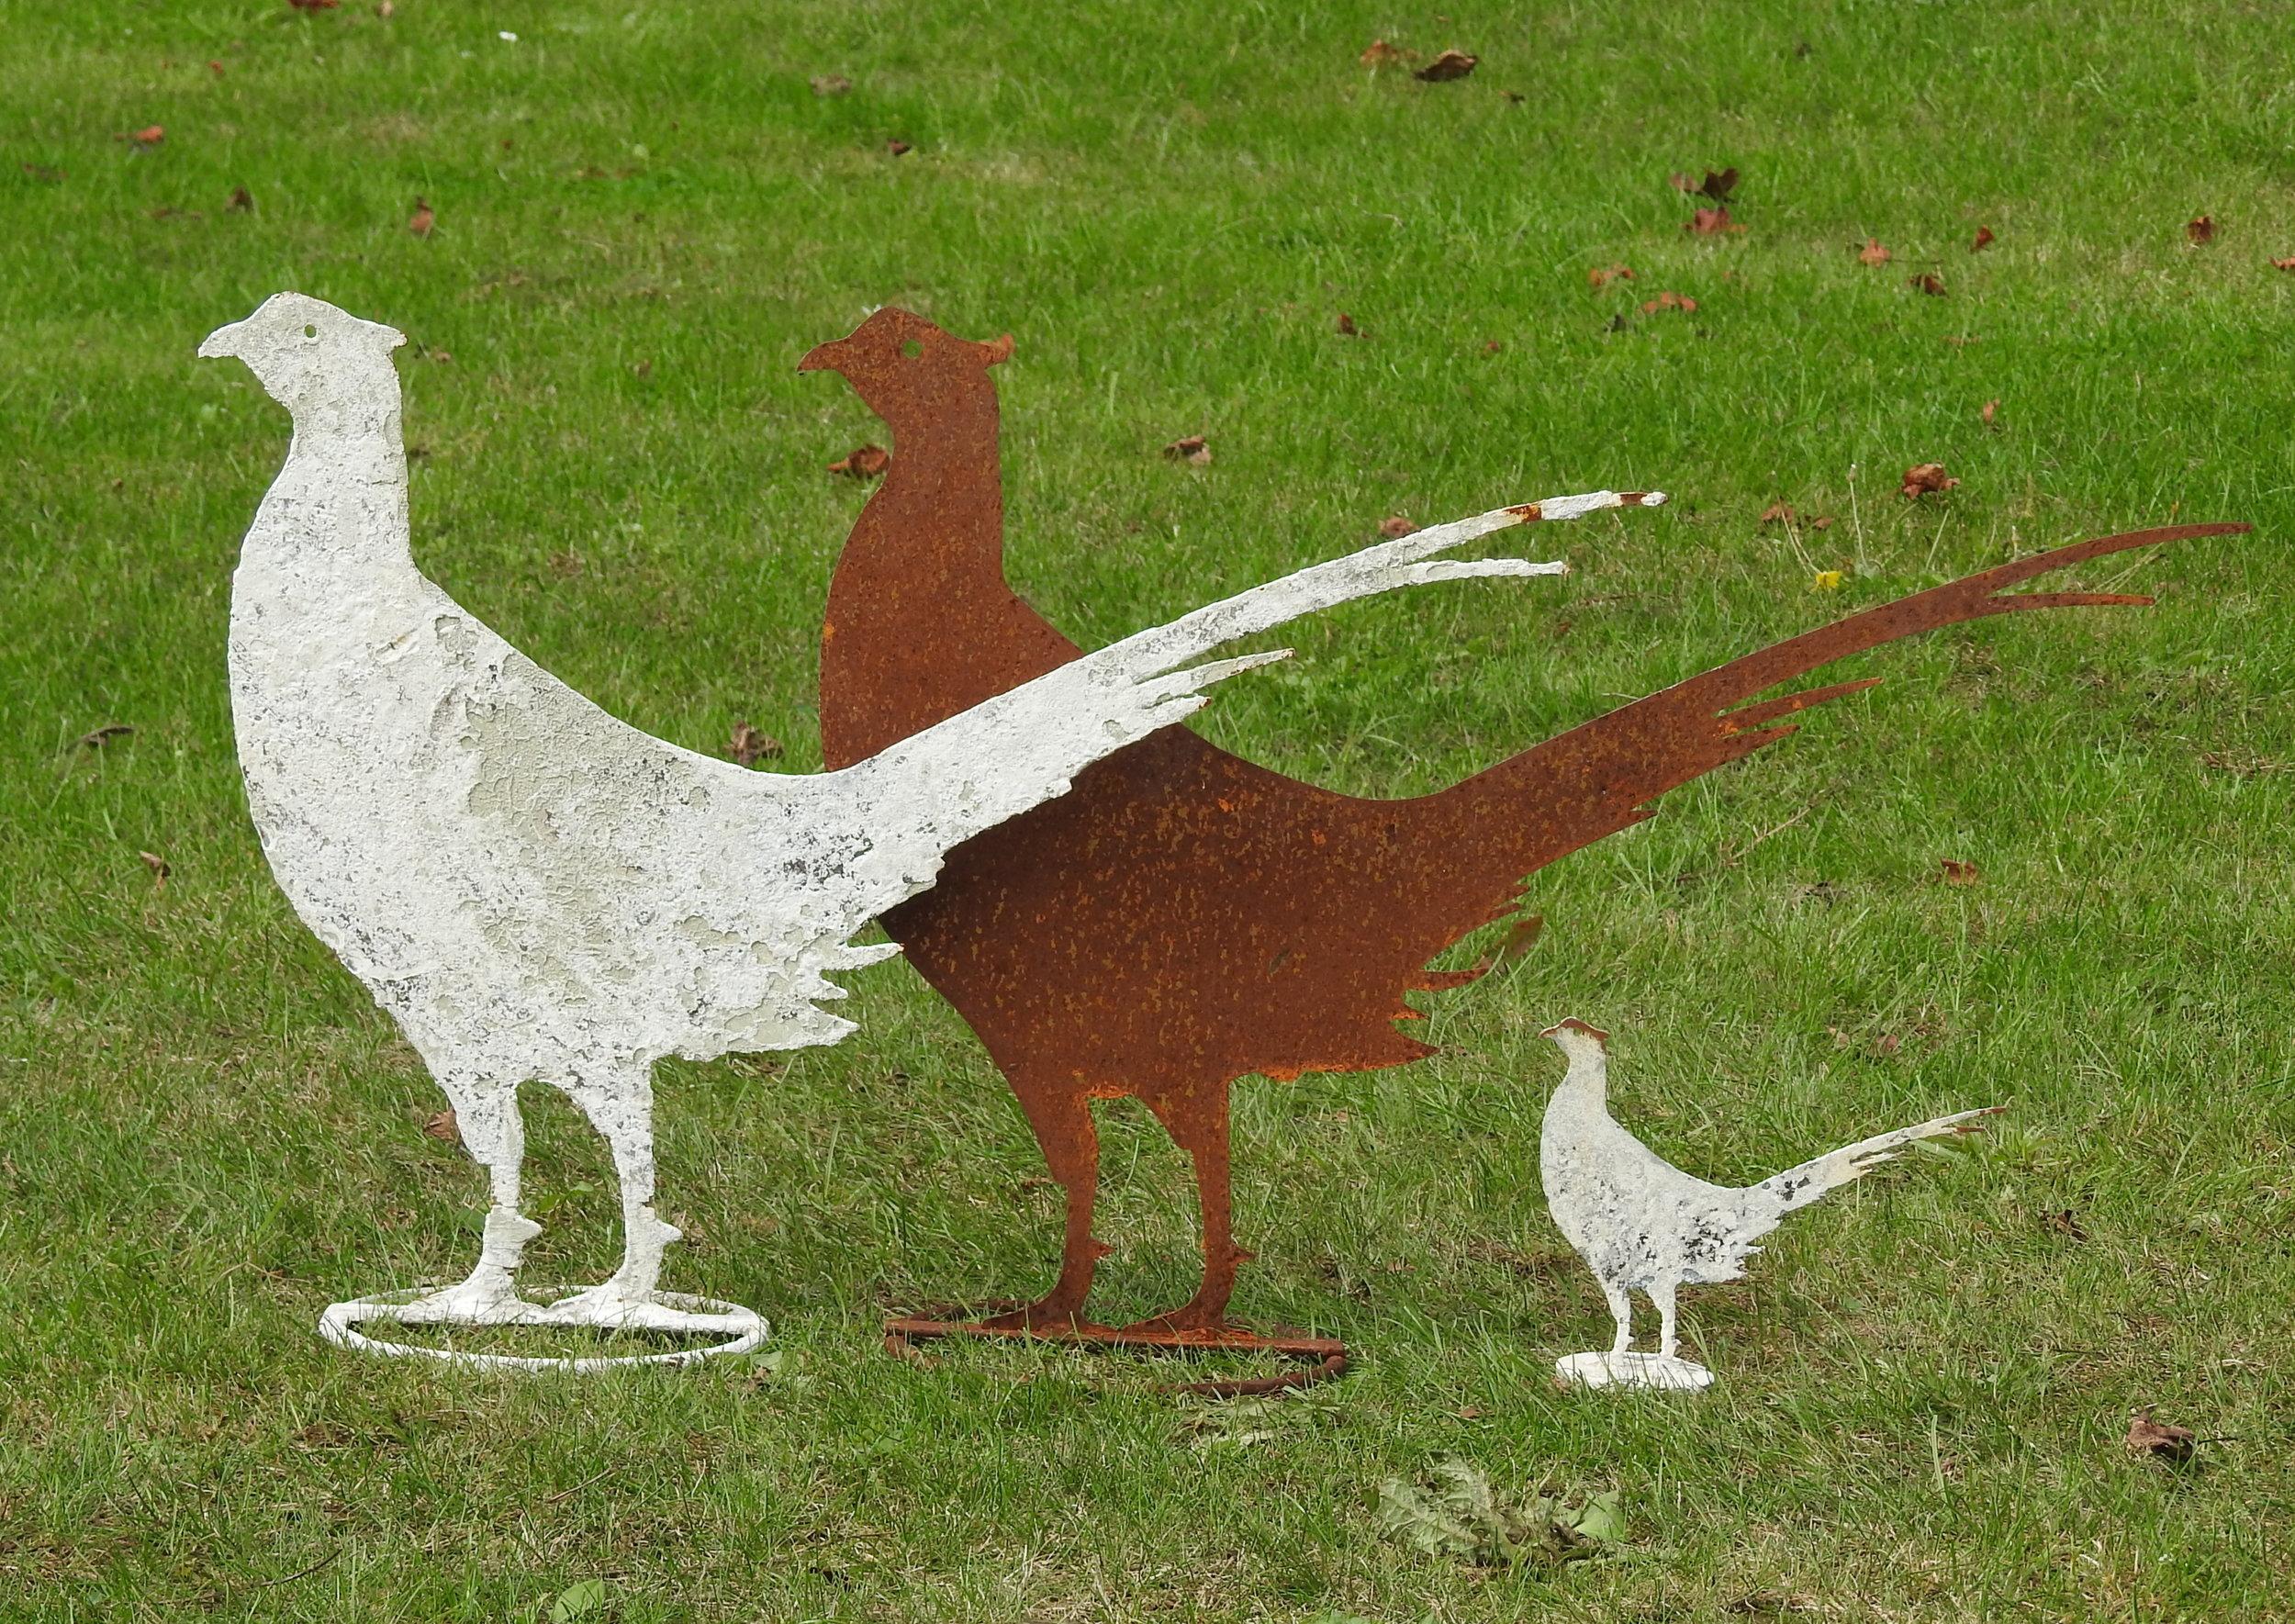 Pheasants - £85 & £28 - Lifesize: 41 x 58cmMini: 14 x 19cm